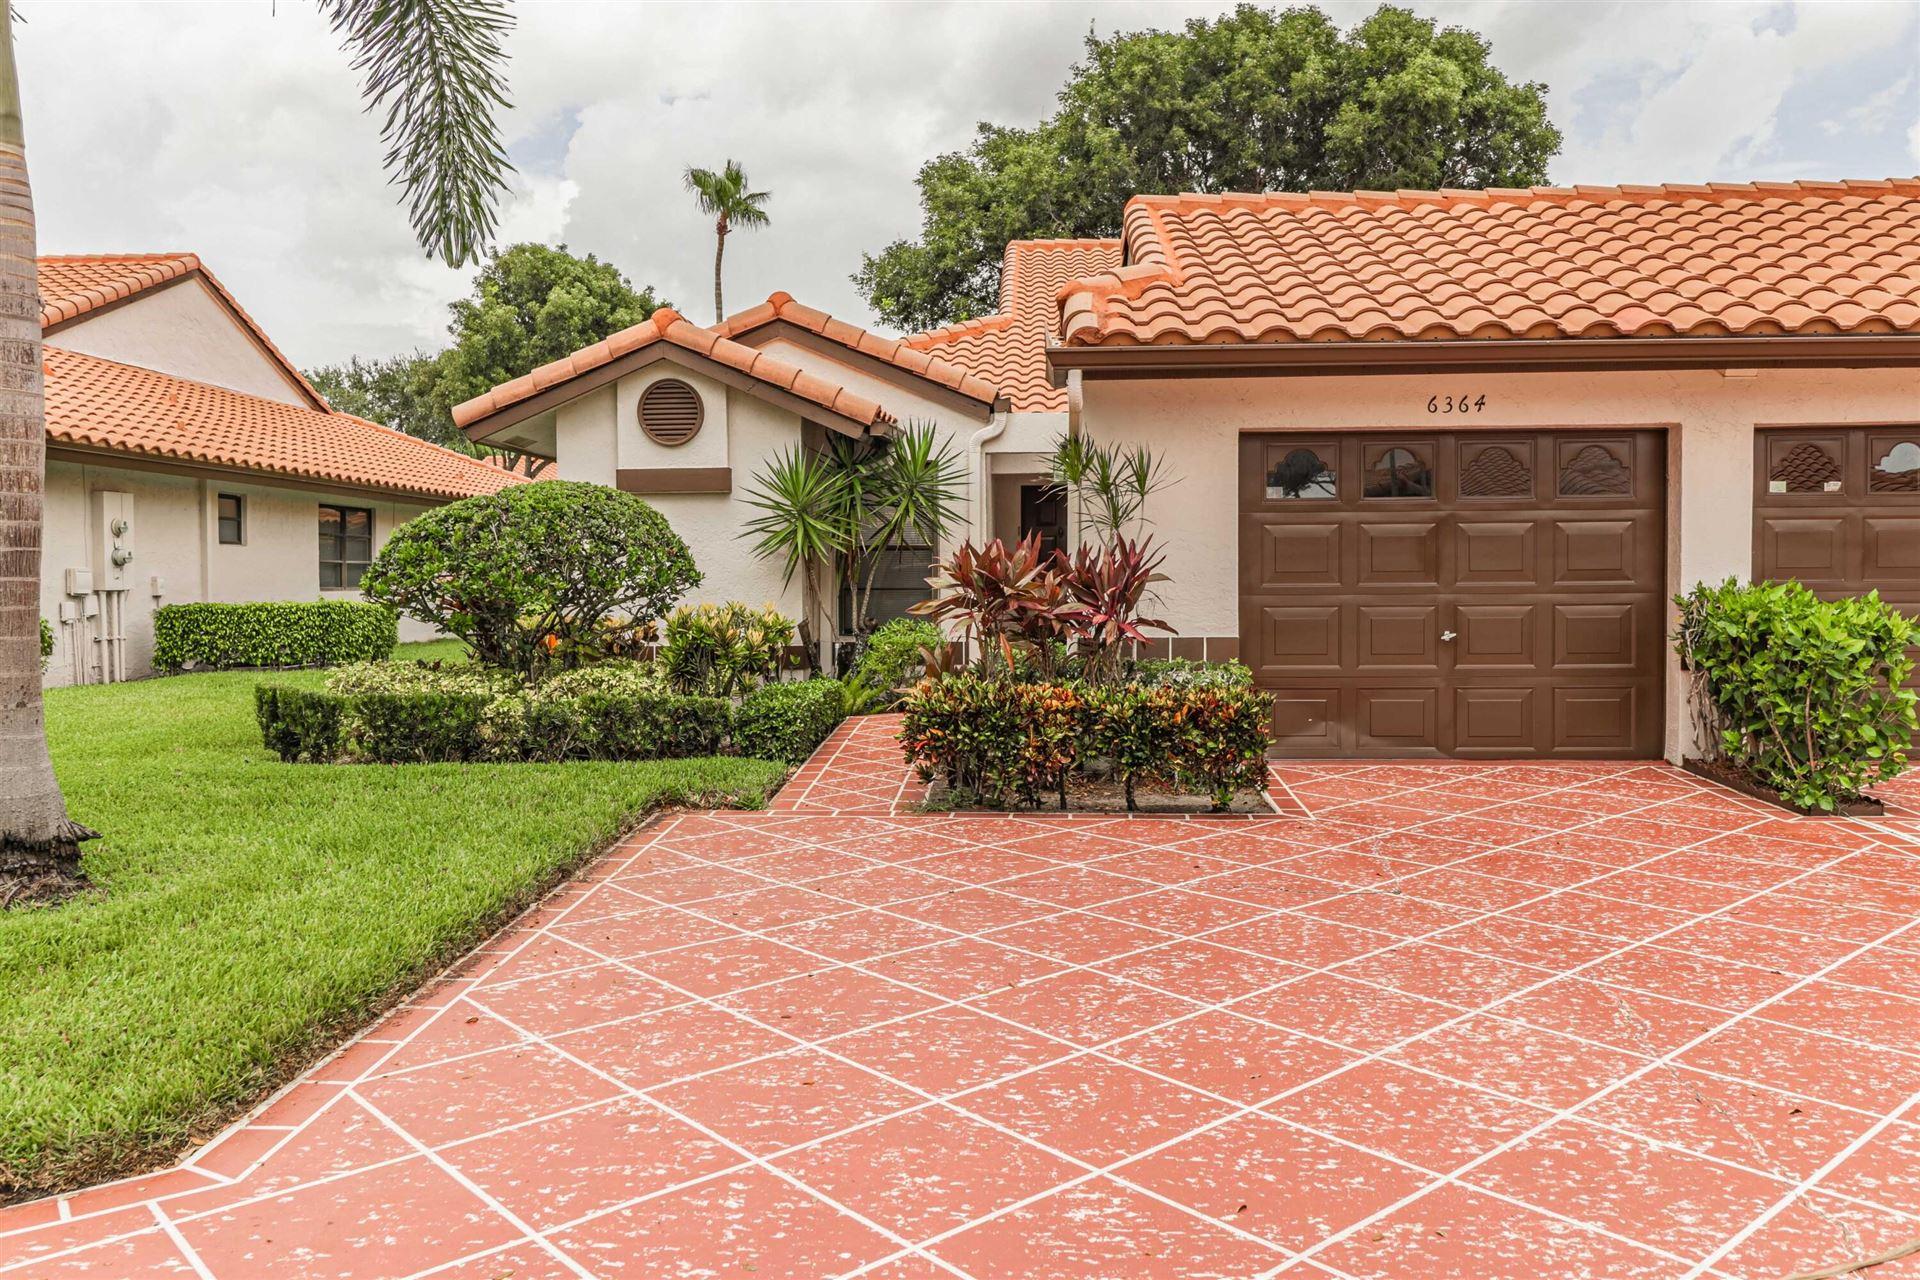 6364 Kings Gate Circle, Delray Beach, FL 33484 - MLS#: RX-10743272